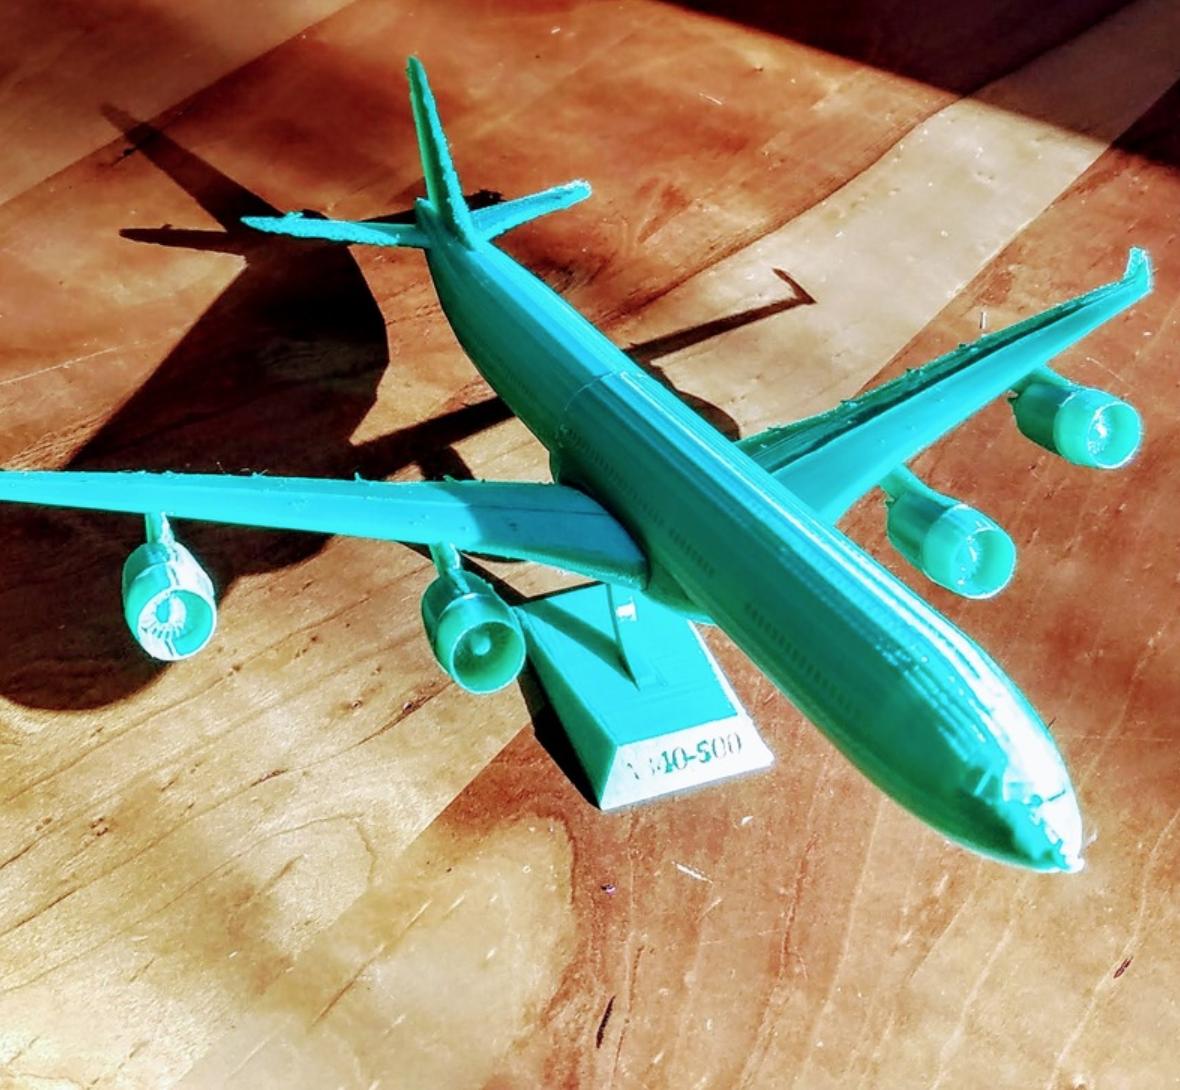 Capture d'écran 2018-02-14 à 11.04.47.png Download free STL file A340 1:200 single bed print • 3D print object, Zippityboomba